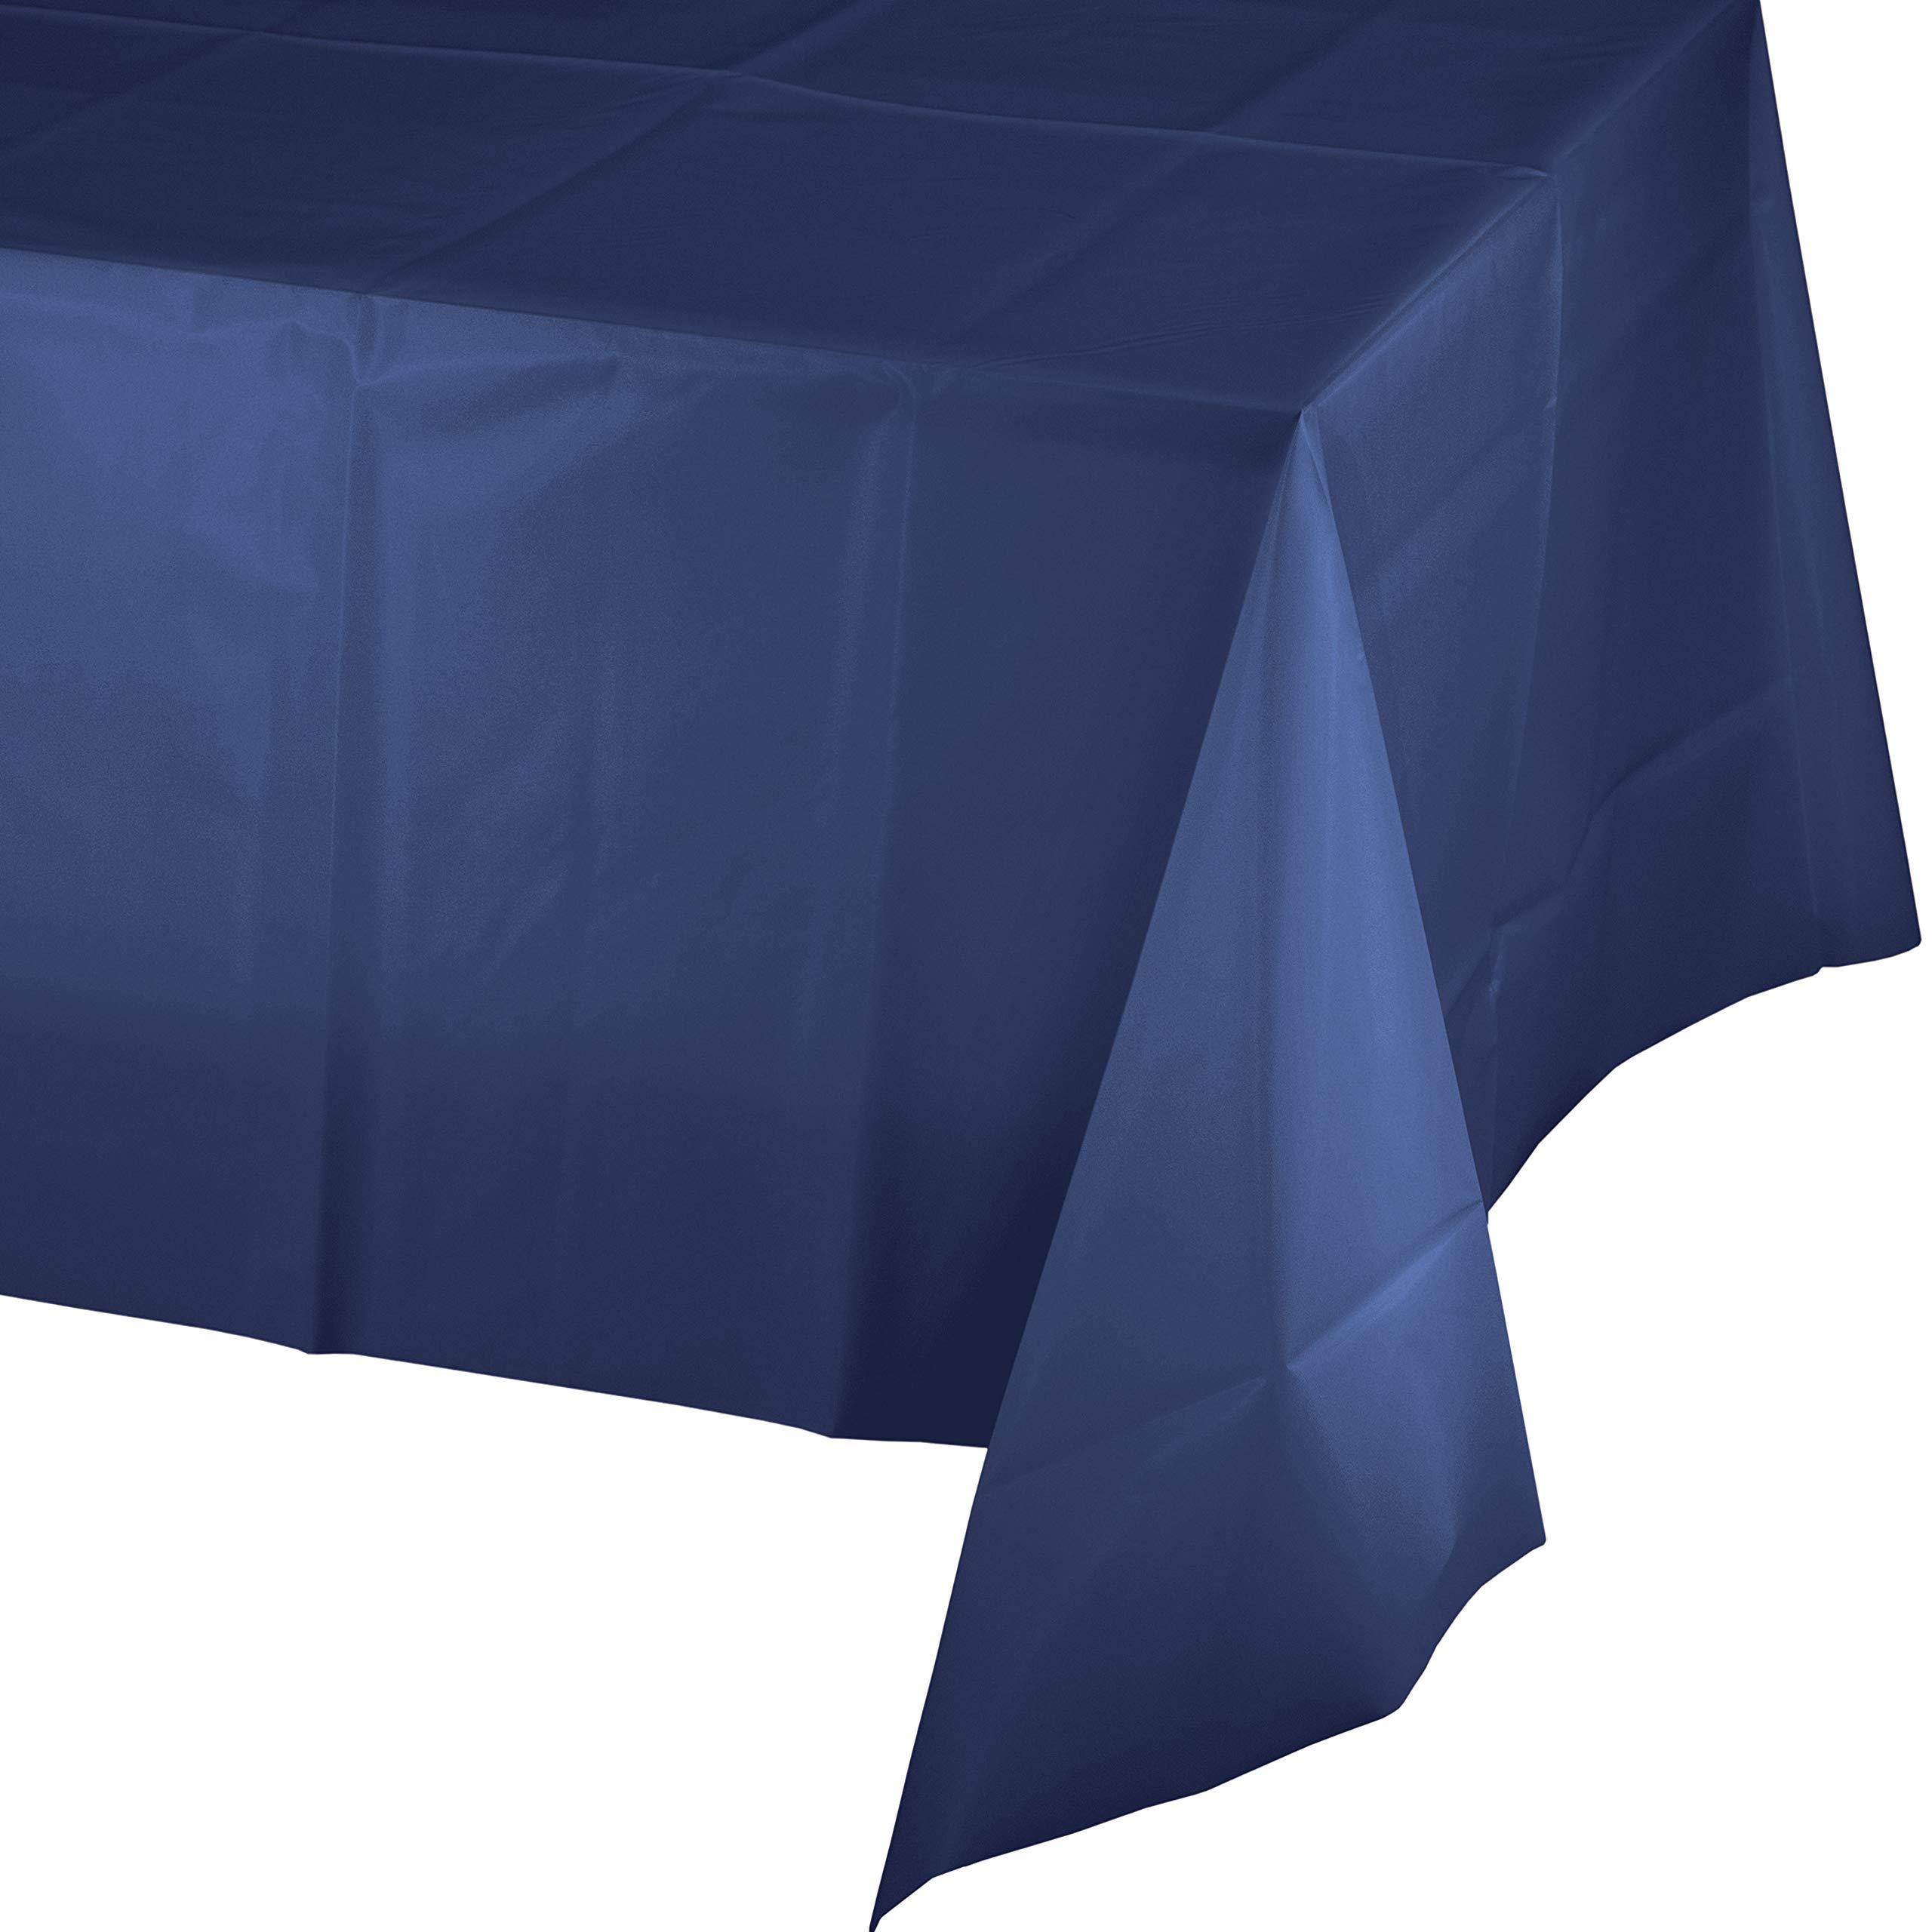 Navy Blue Plastic Tablecloths, 3 ct